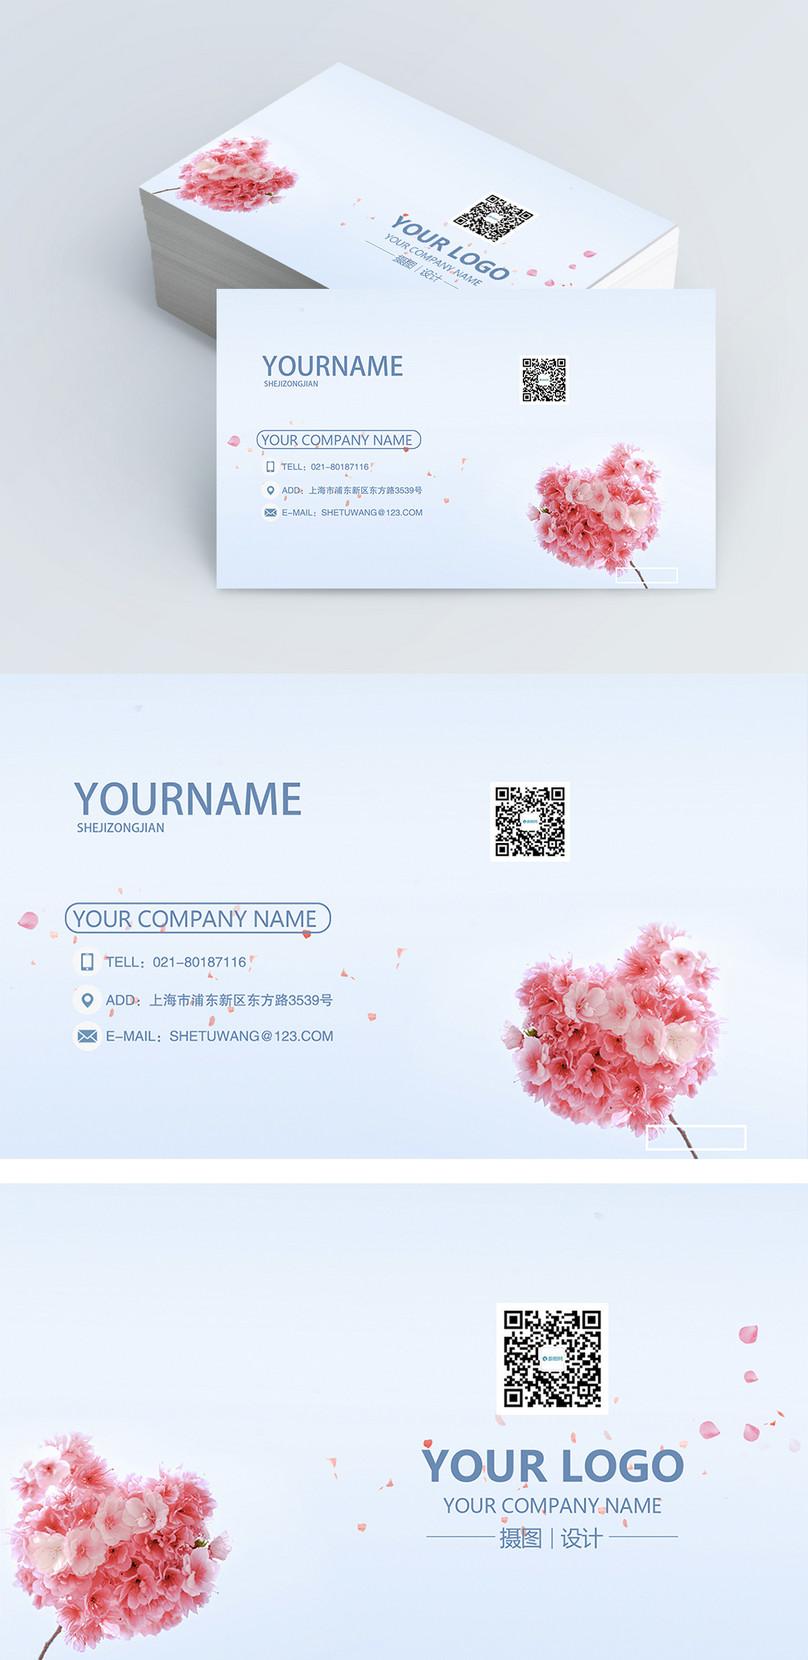 Red petals heart shaped business card photo imagepicture free red petals heart shaped business card colourmoves